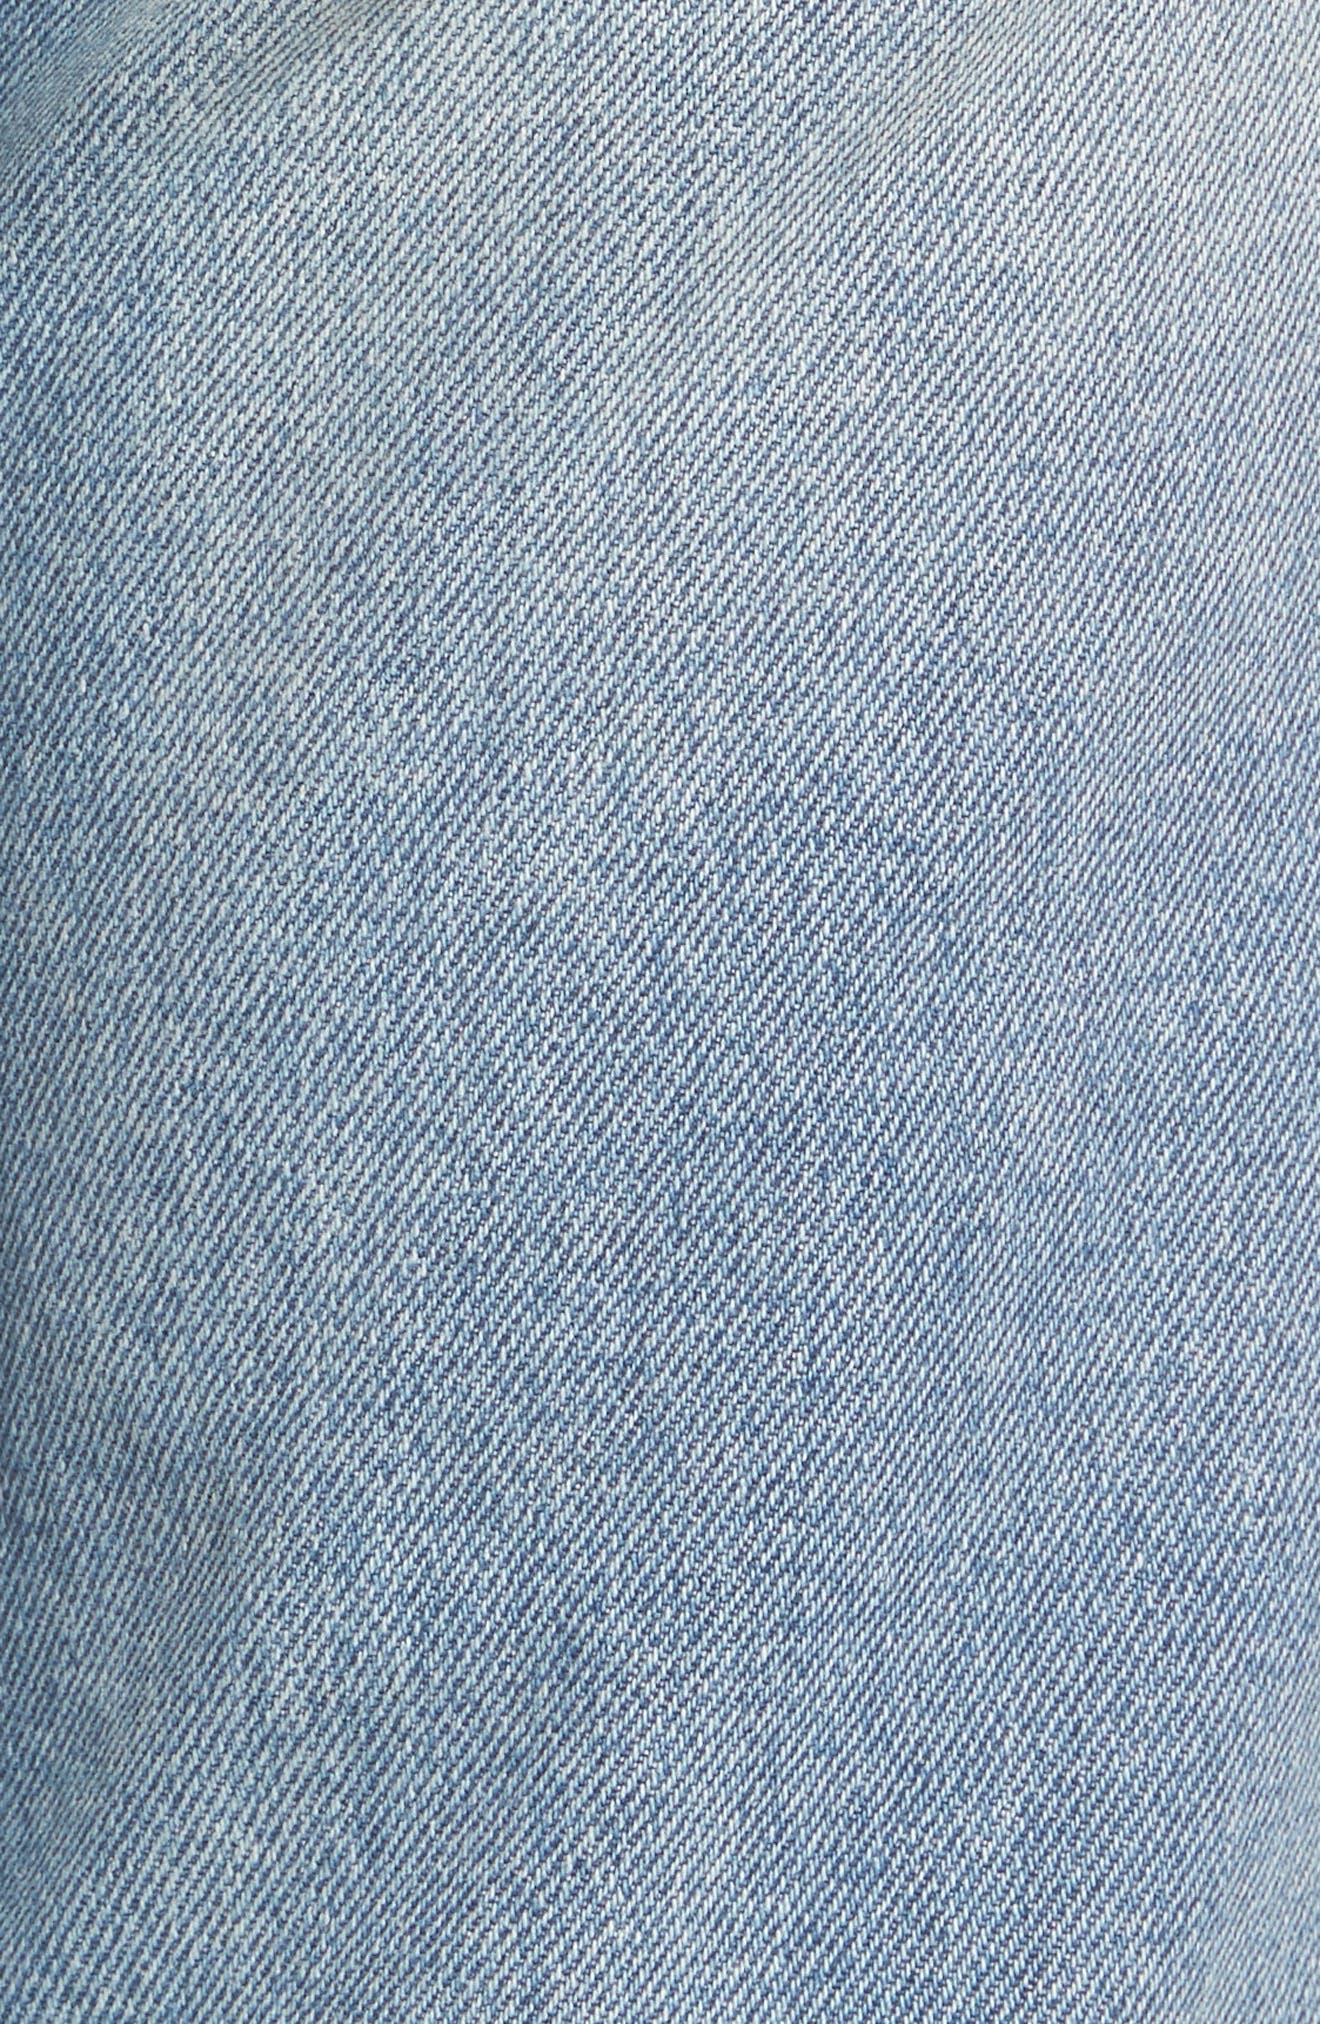 Sundays Straggler High Waist Jeans,                             Alternate thumbnail 5, color,